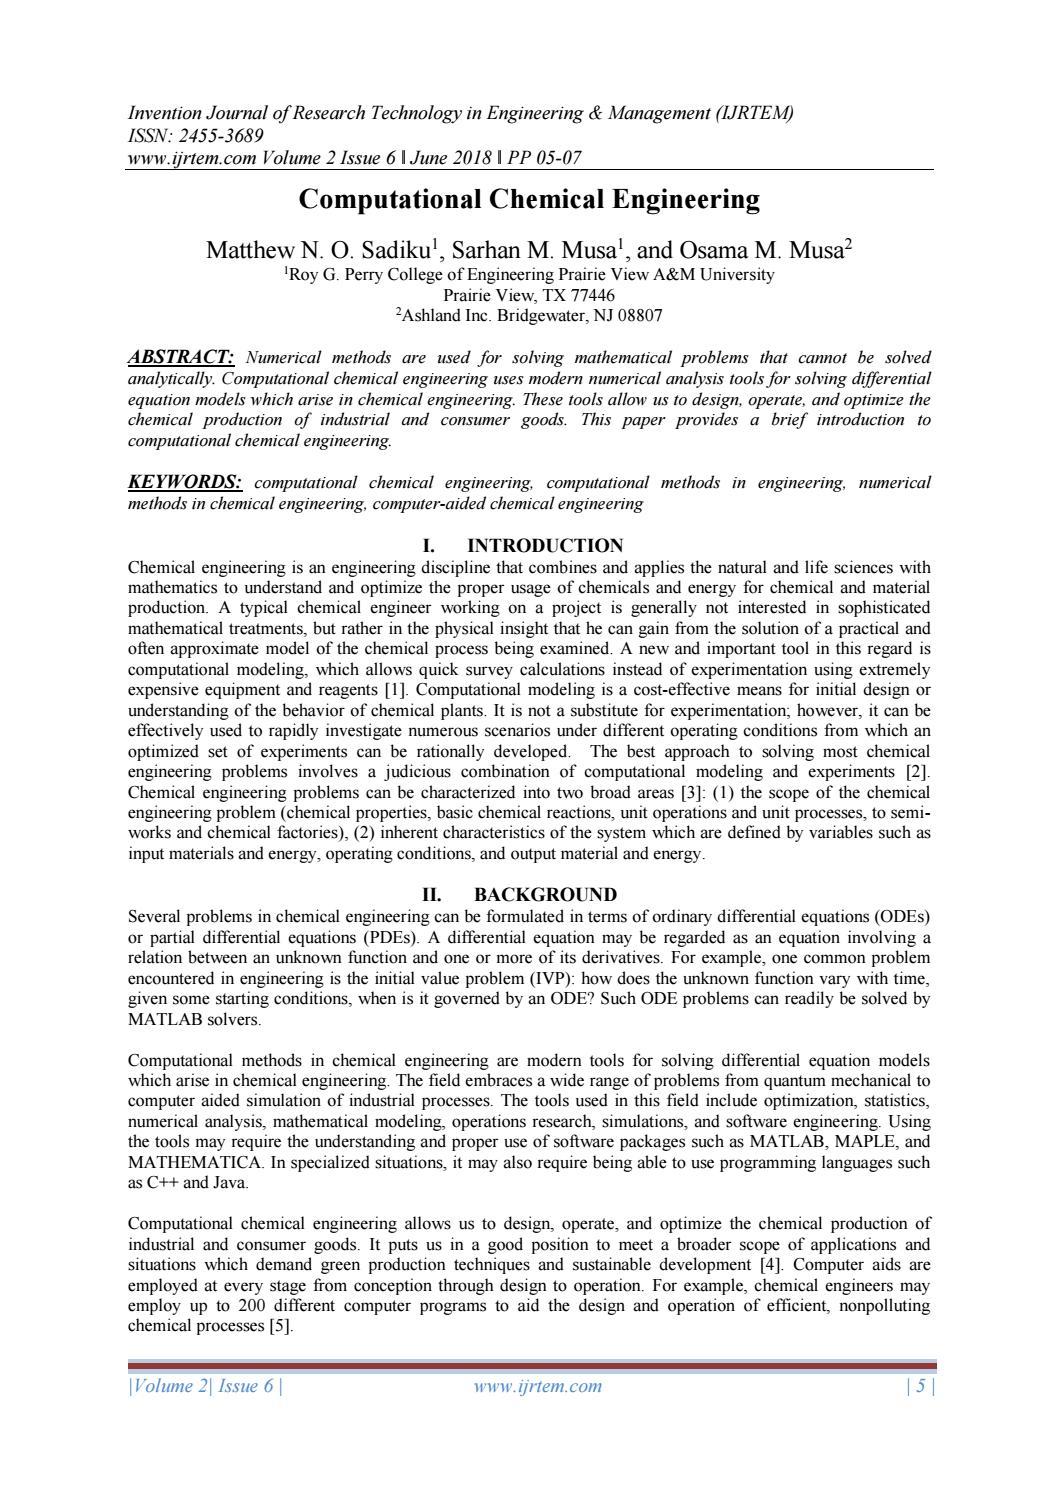 Computational Chemical Engineering By Journal Ijrtem Issuu